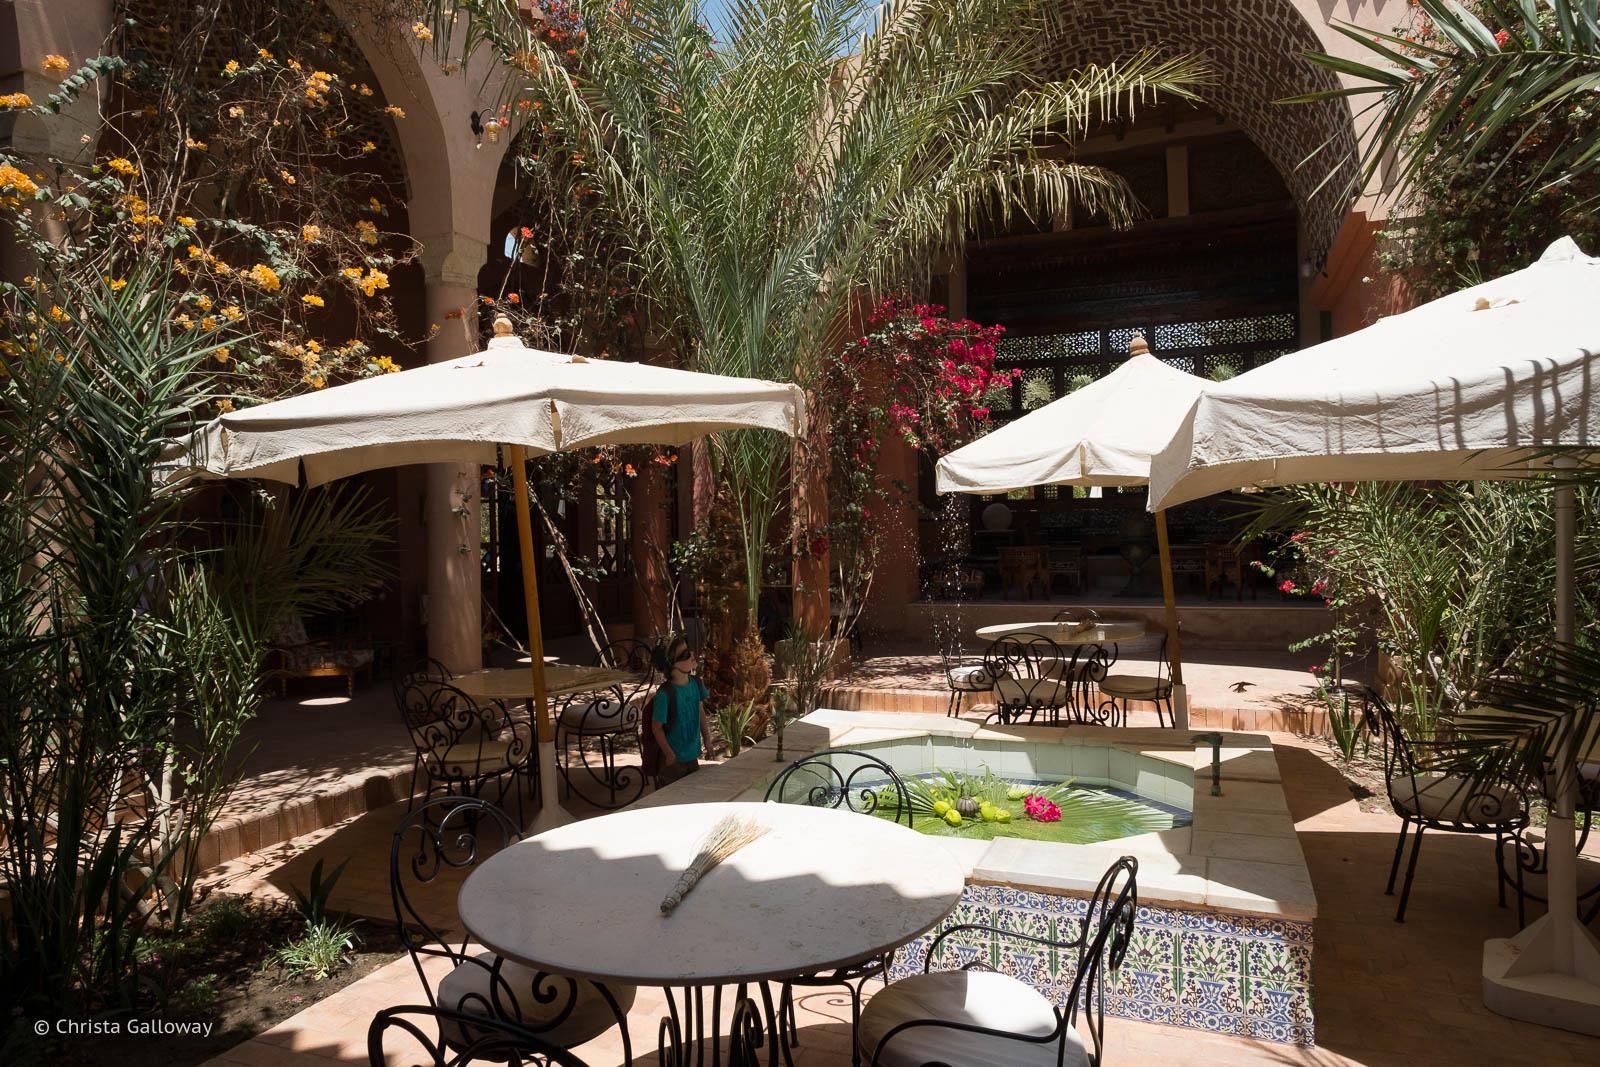 el-moudira-hotel-luxor-ckgalloway-3483.jpg